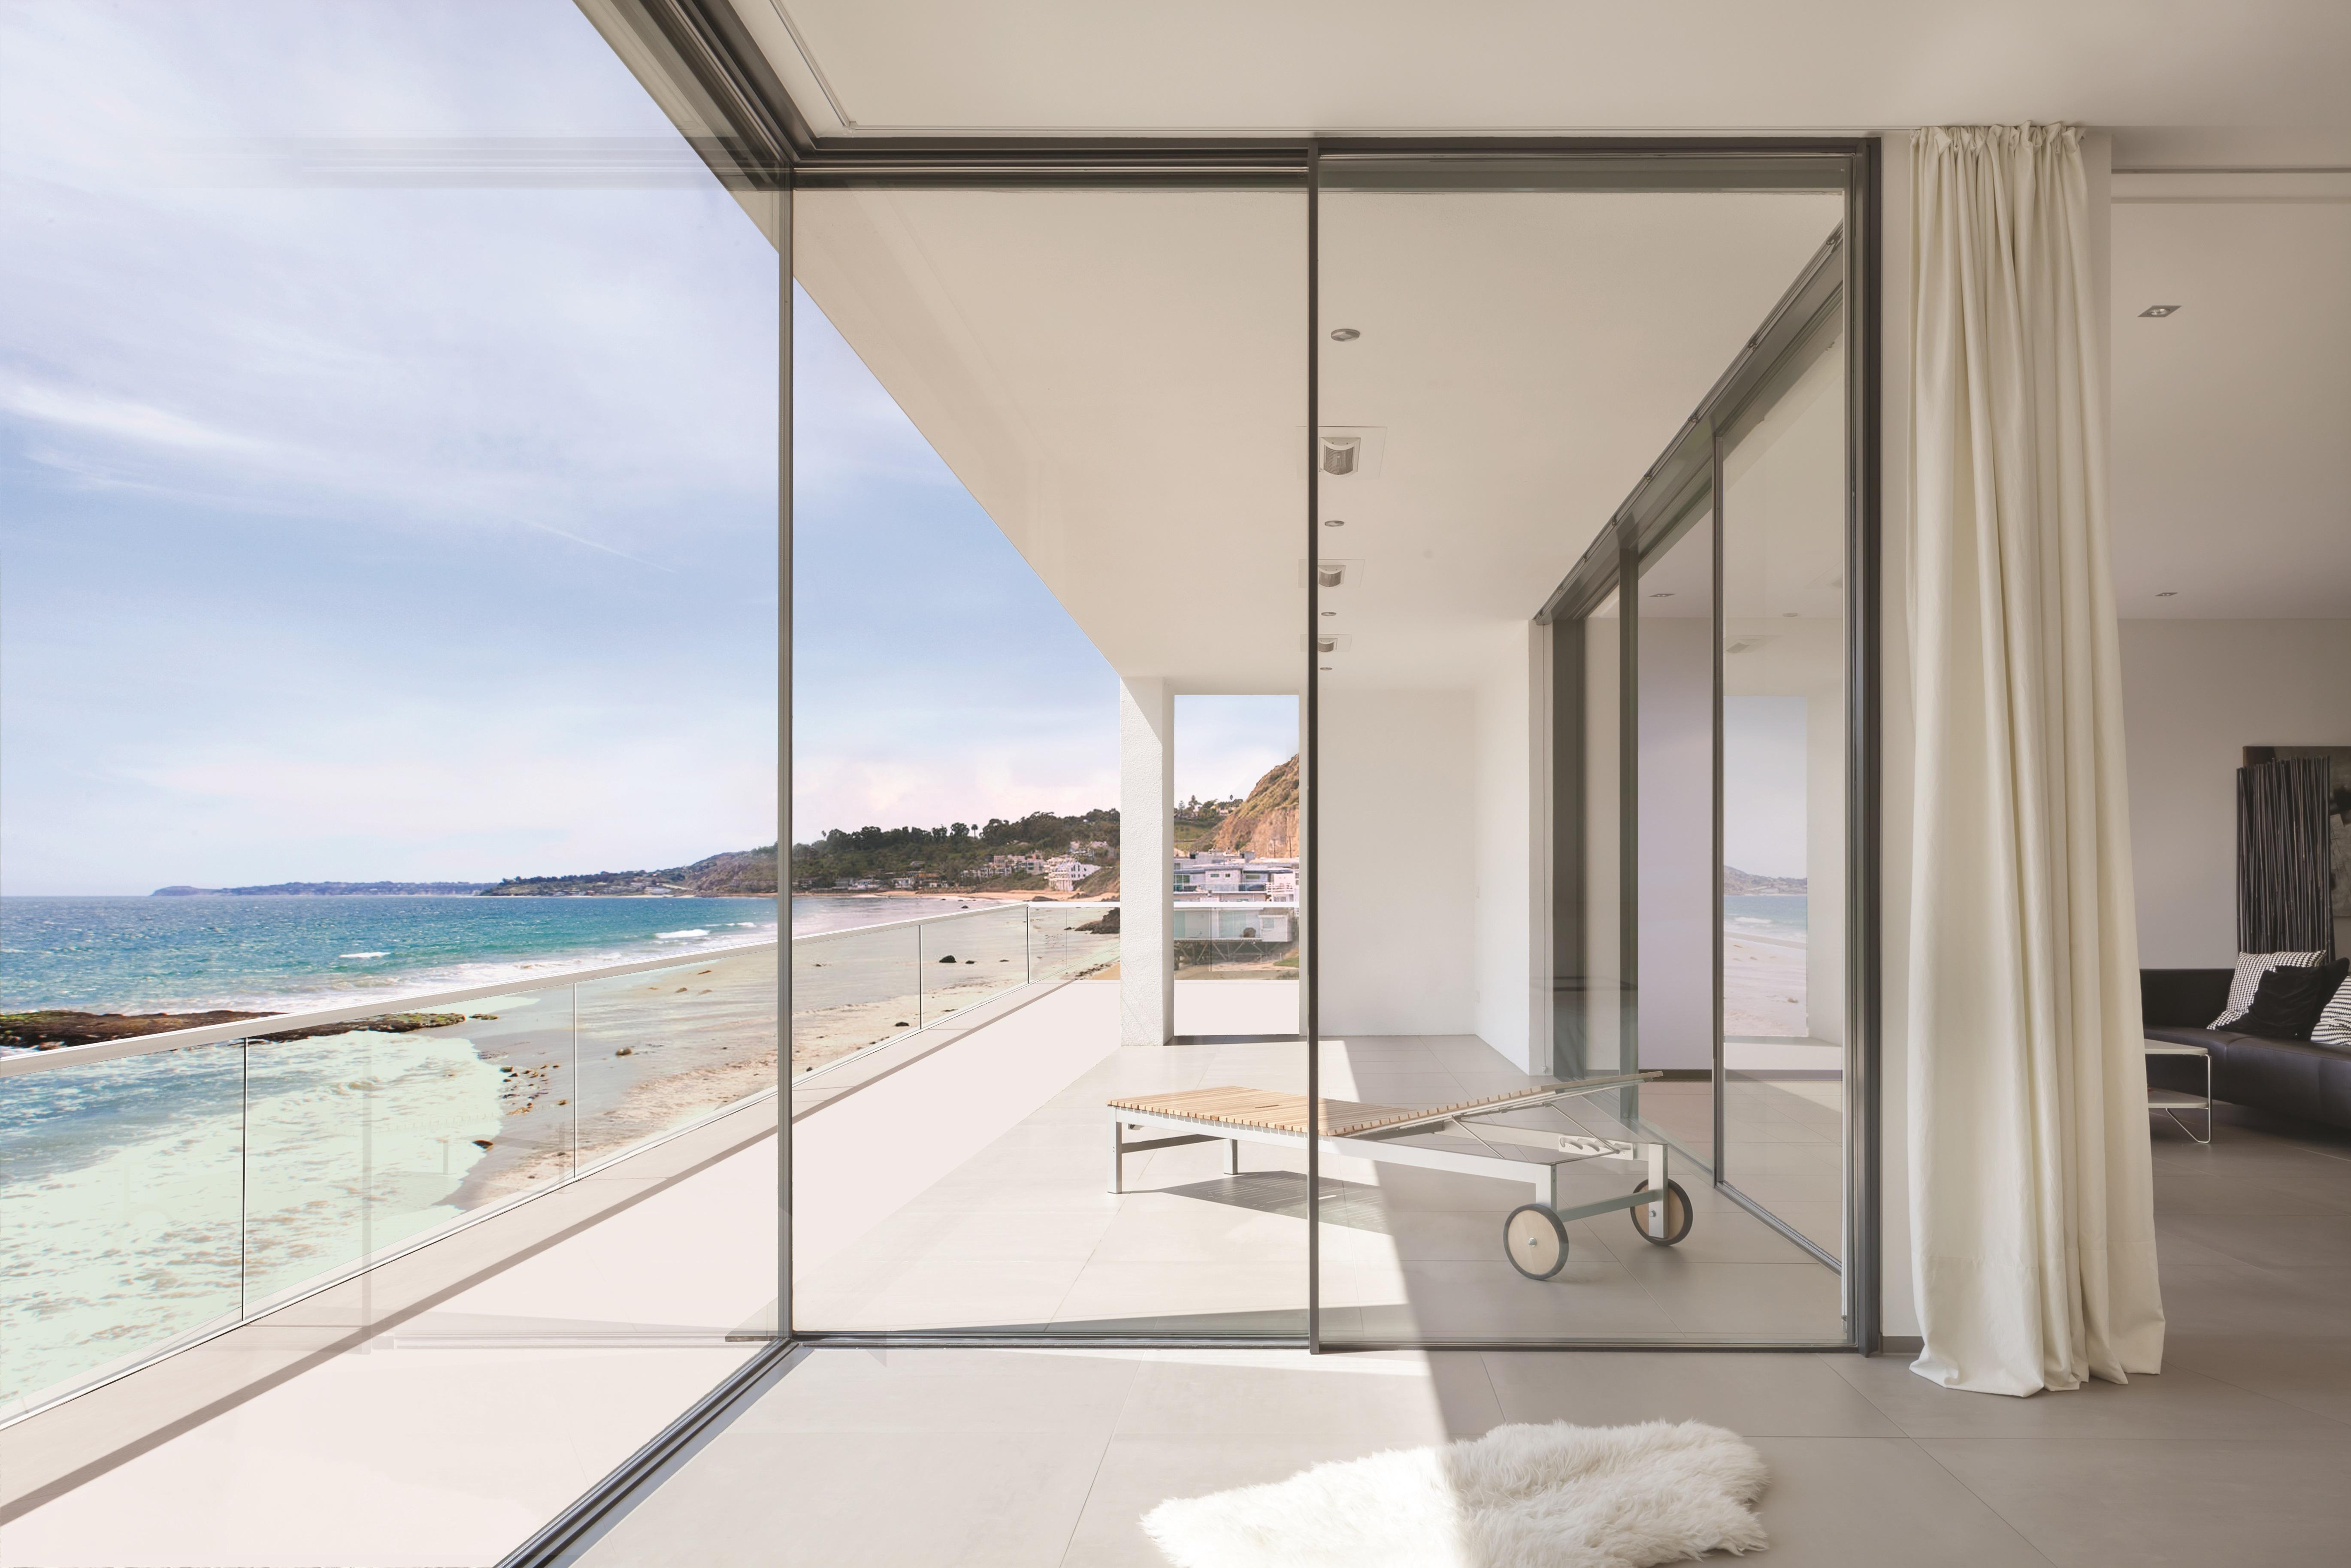 Minimal framed sliding glass wall system for residential pro for Sliding glass door wall